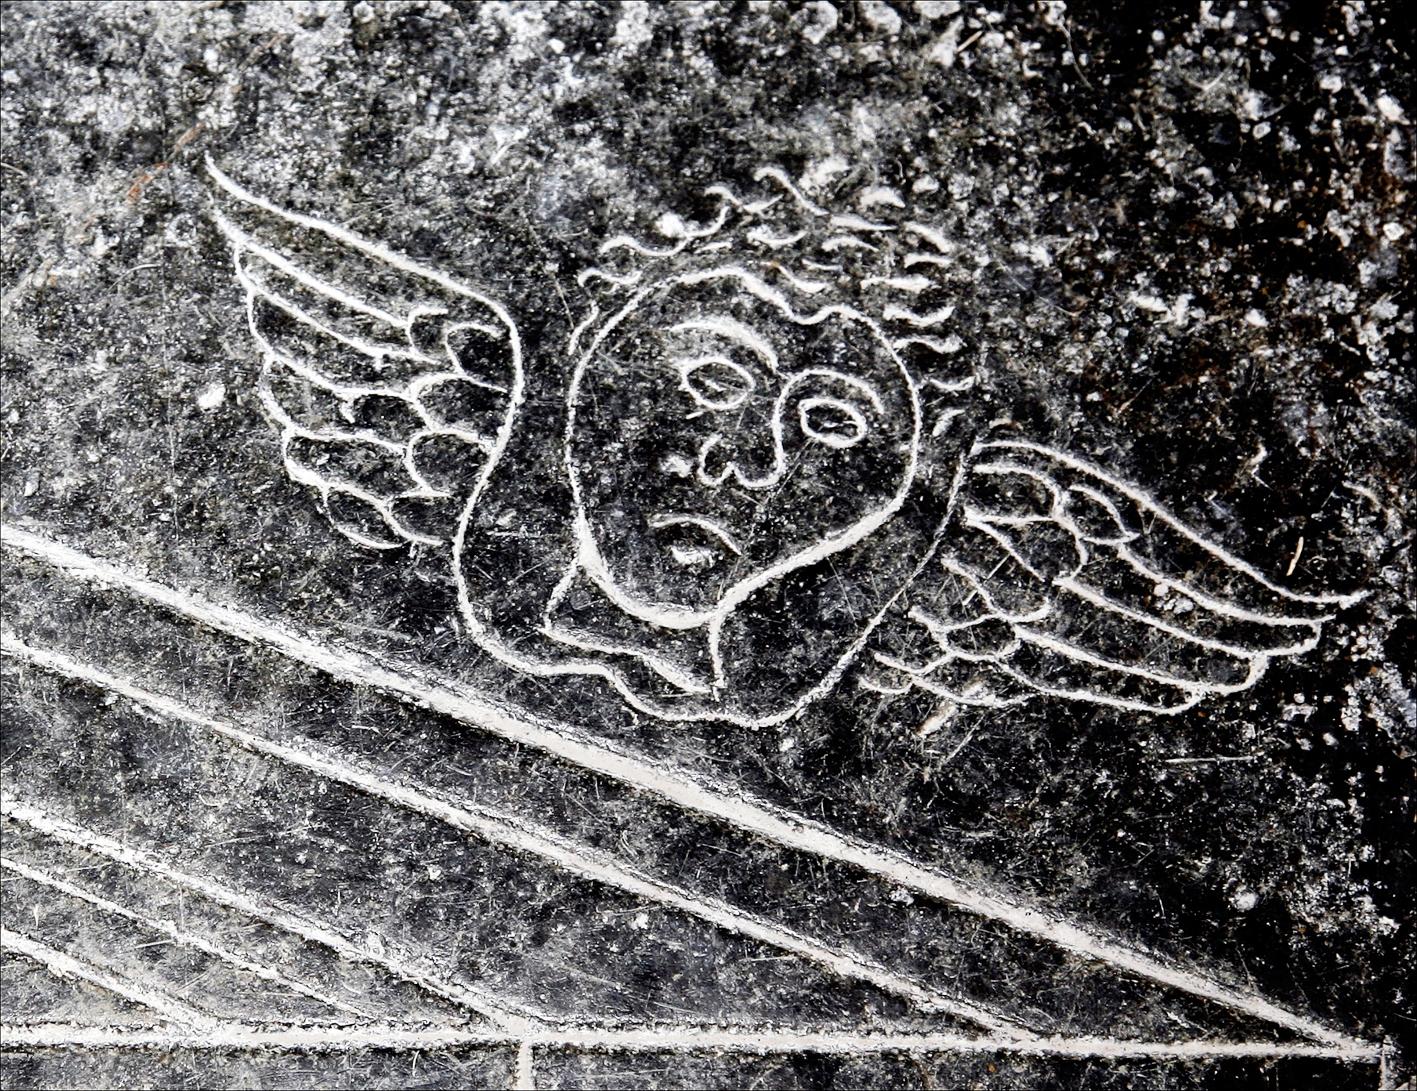 21. Discover medieval graffiti